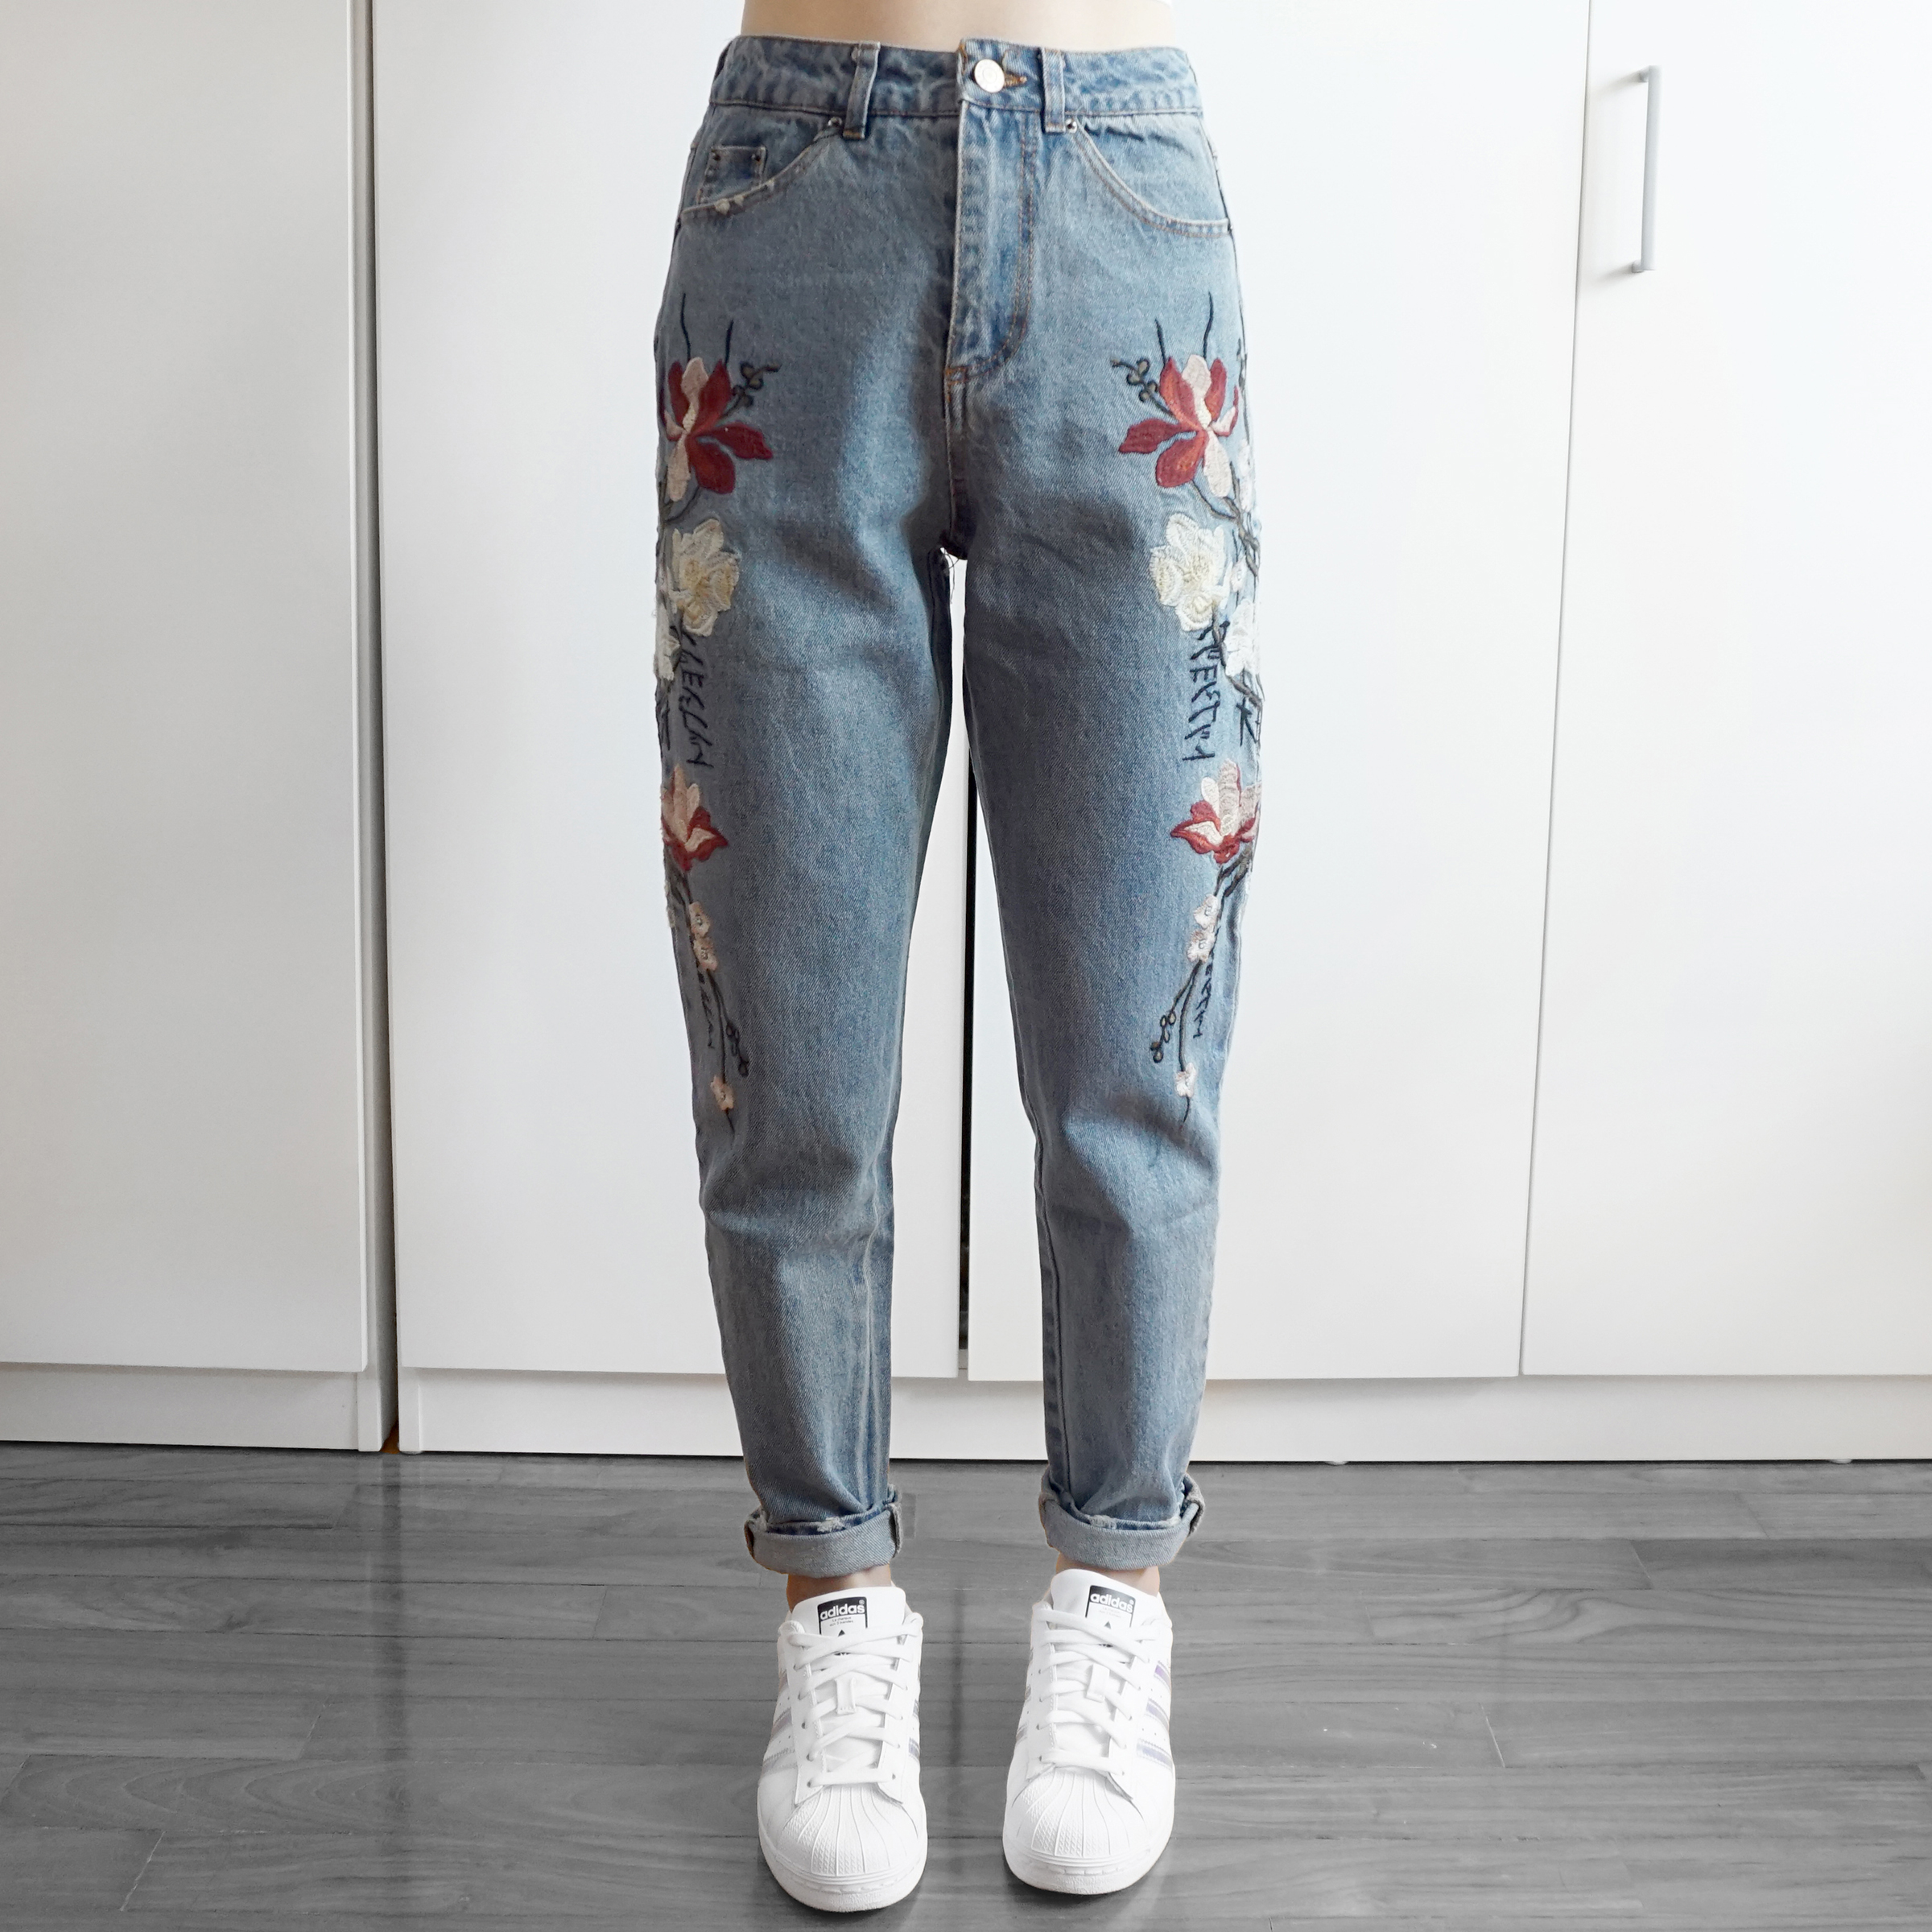 850c3e94882 Embroidered Floral Boyfriend Denim Jeans (Med Blue) - Thumbnail 1 ...